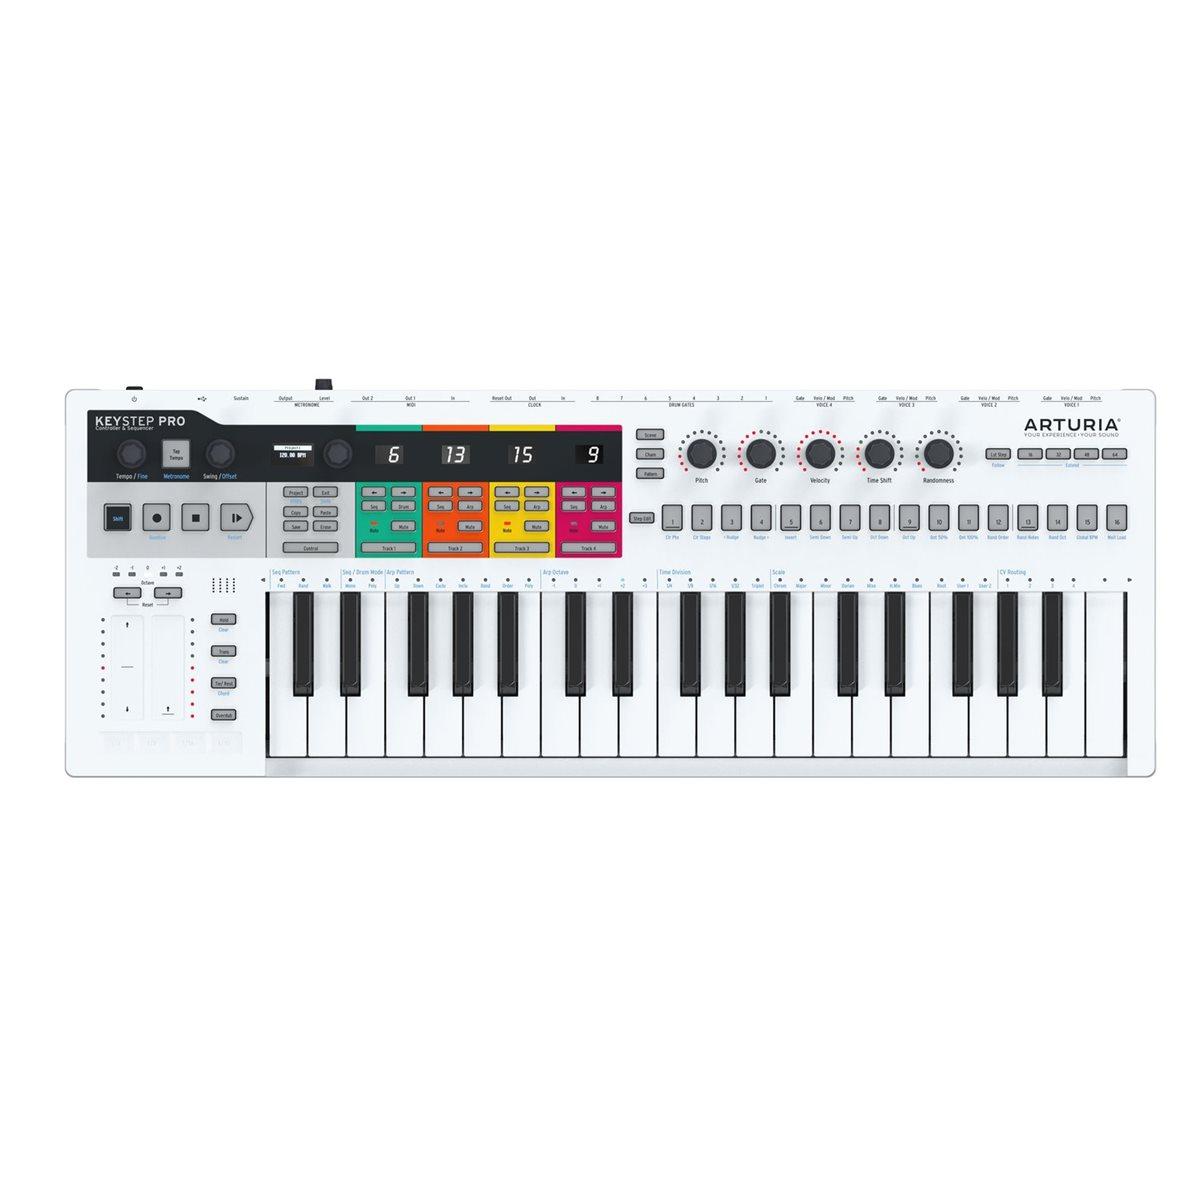 ARTURIA - KeyStep Pro Sequencer / Controller - 37 KEYS